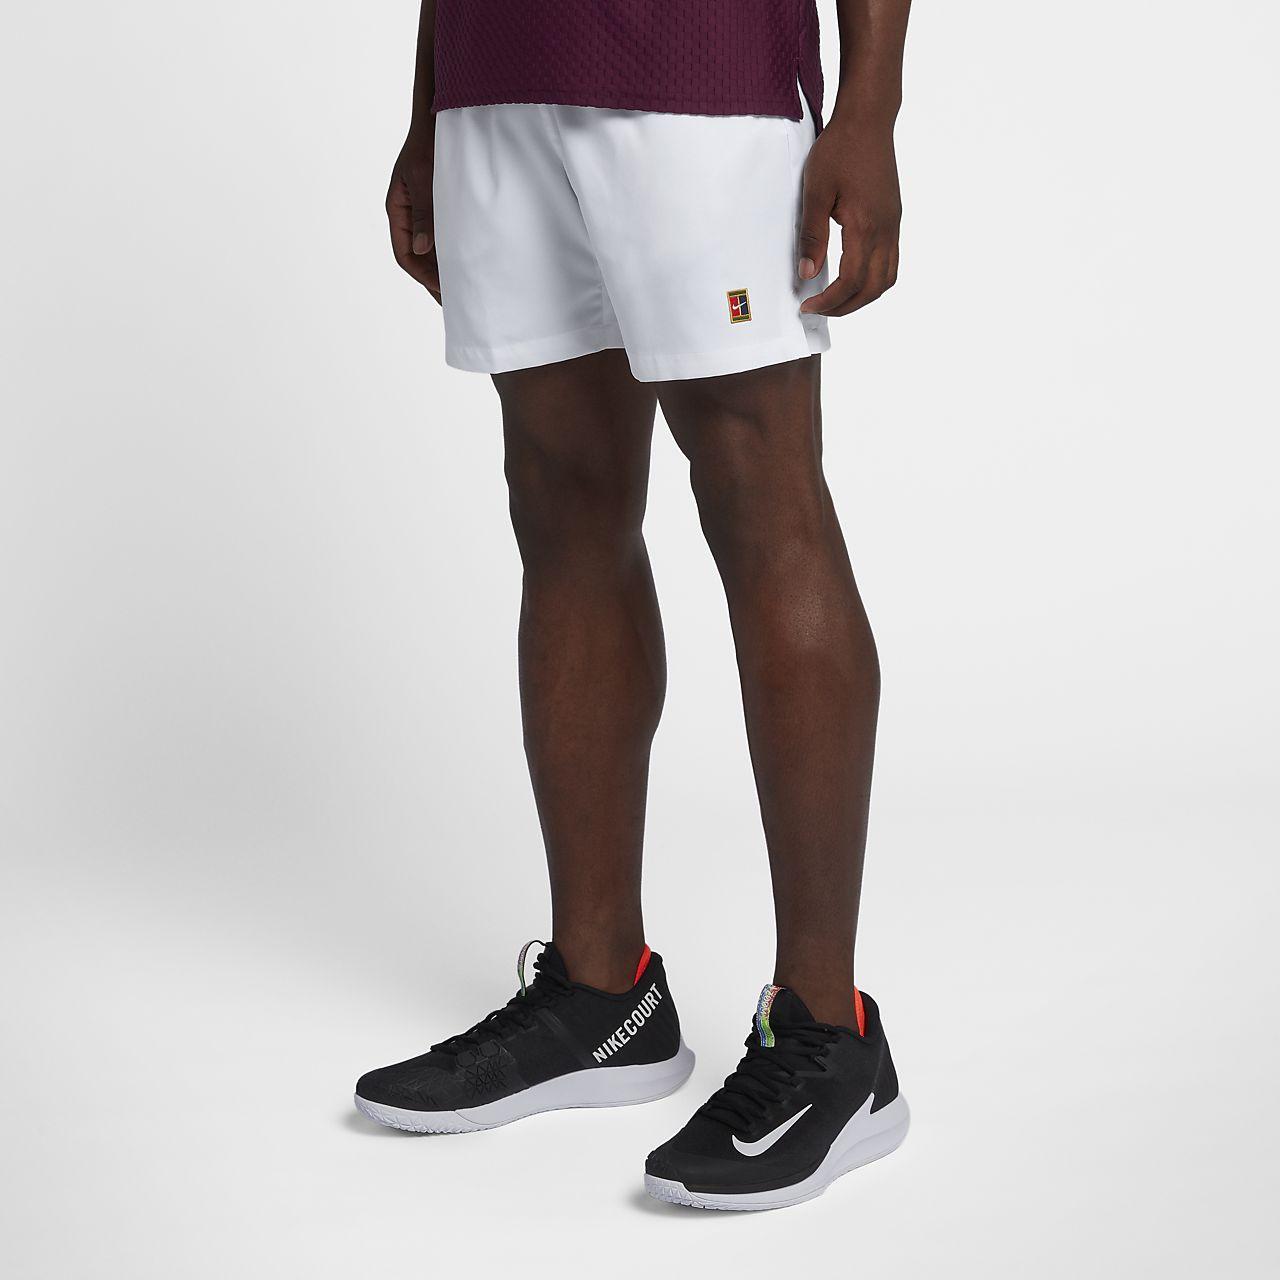 8698bb6002d NikeCourt Dri-FIT Men s Tennis Shorts. Nike.com AU